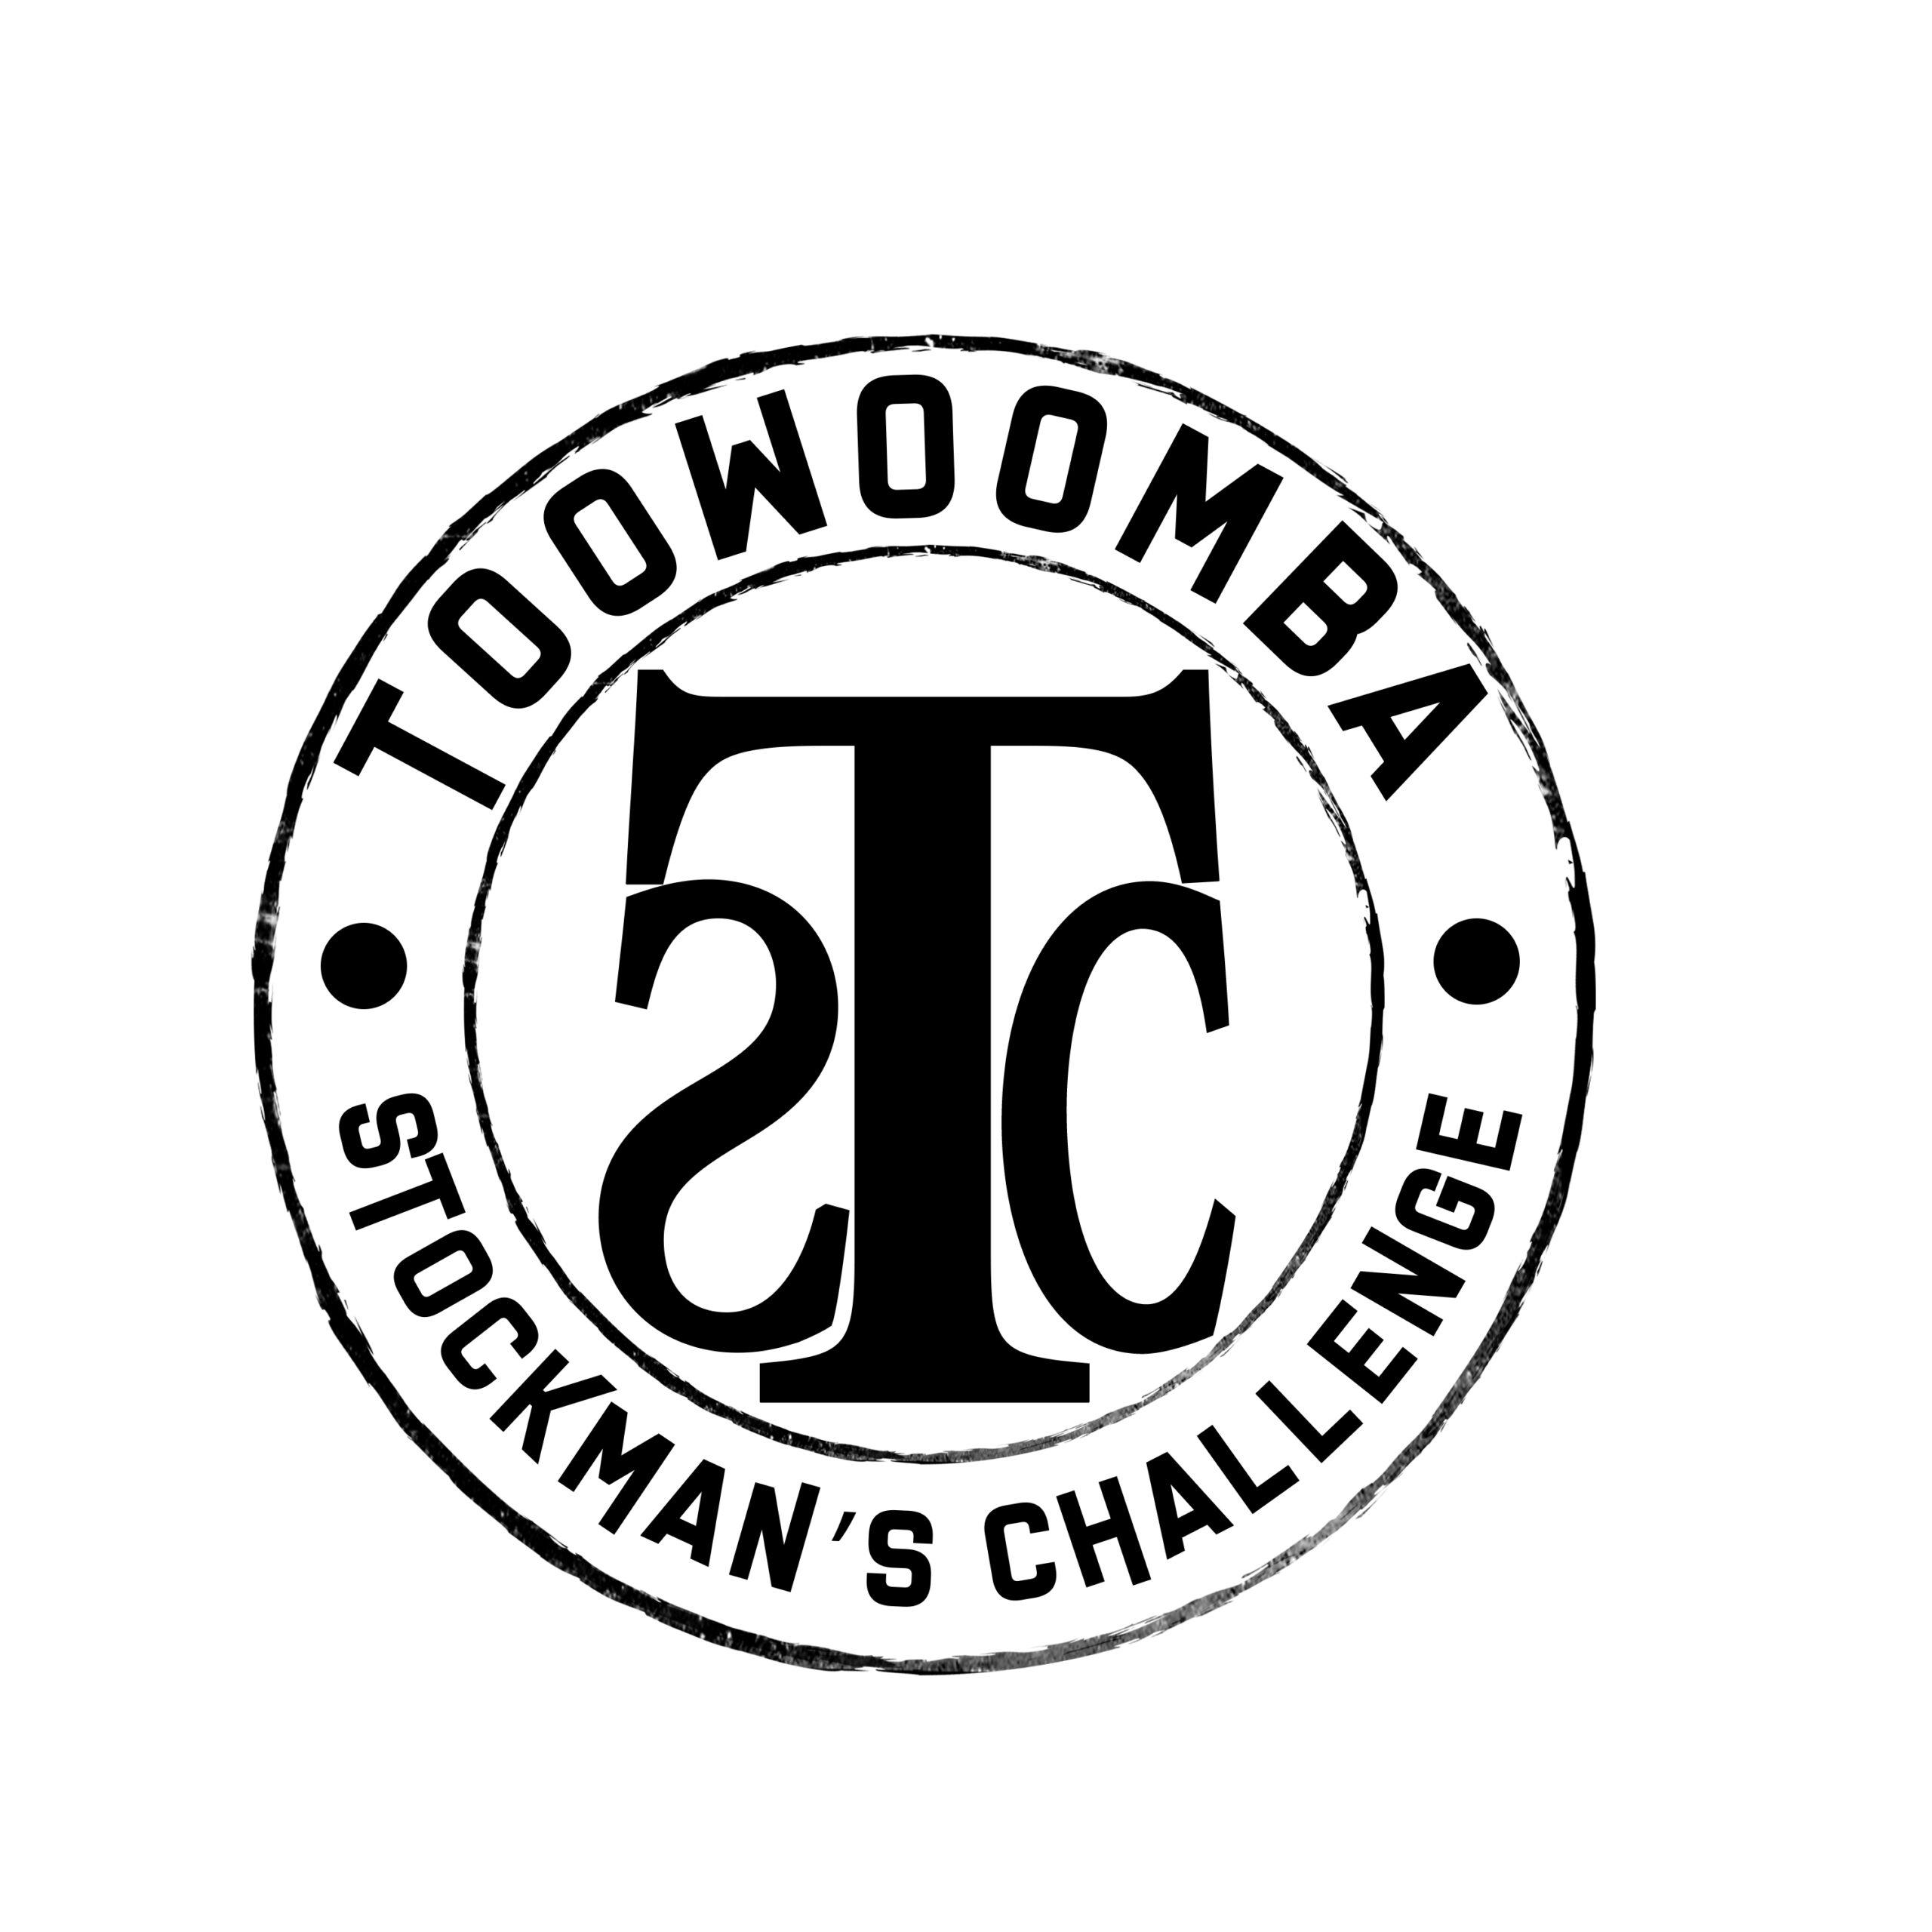 Toowoomba Stockman's Challenge & Campdraft